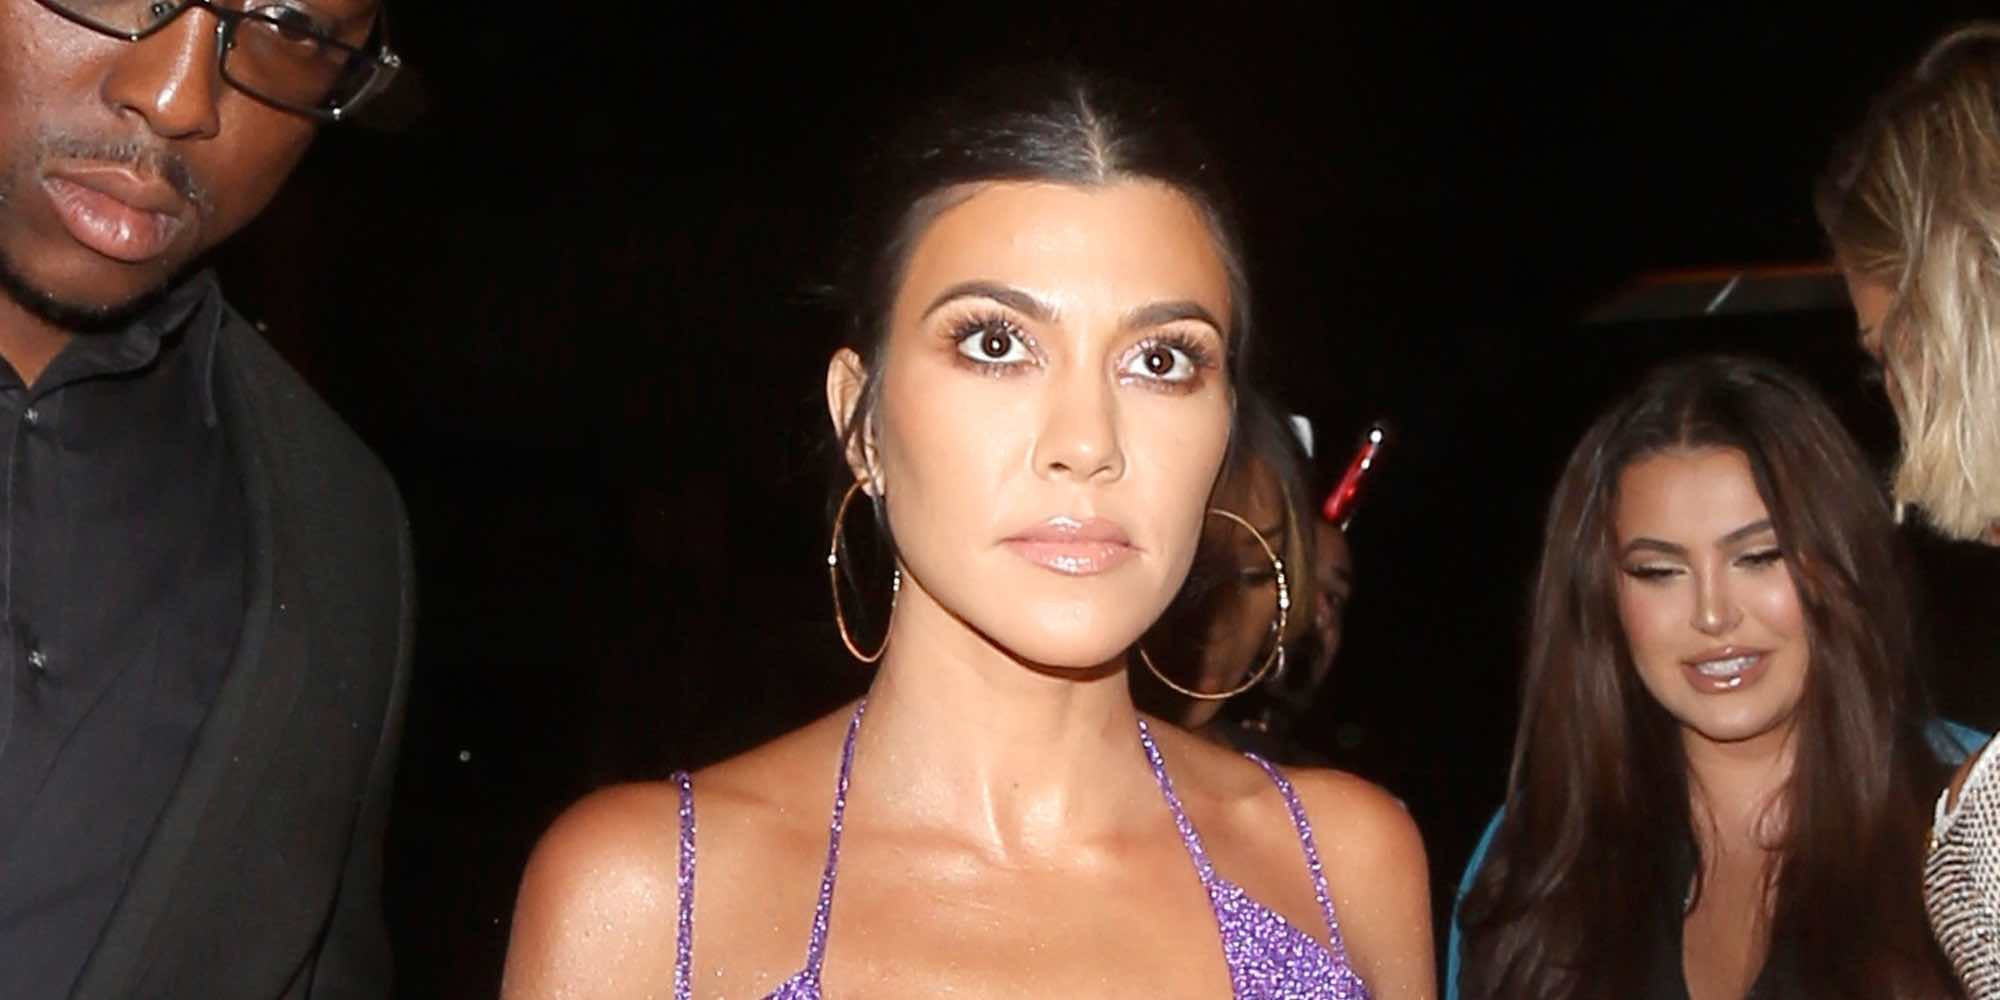 Kim y Khloe Kardashian presionan a Kourtney Kardashian y Scott Disick para que retomen su romance